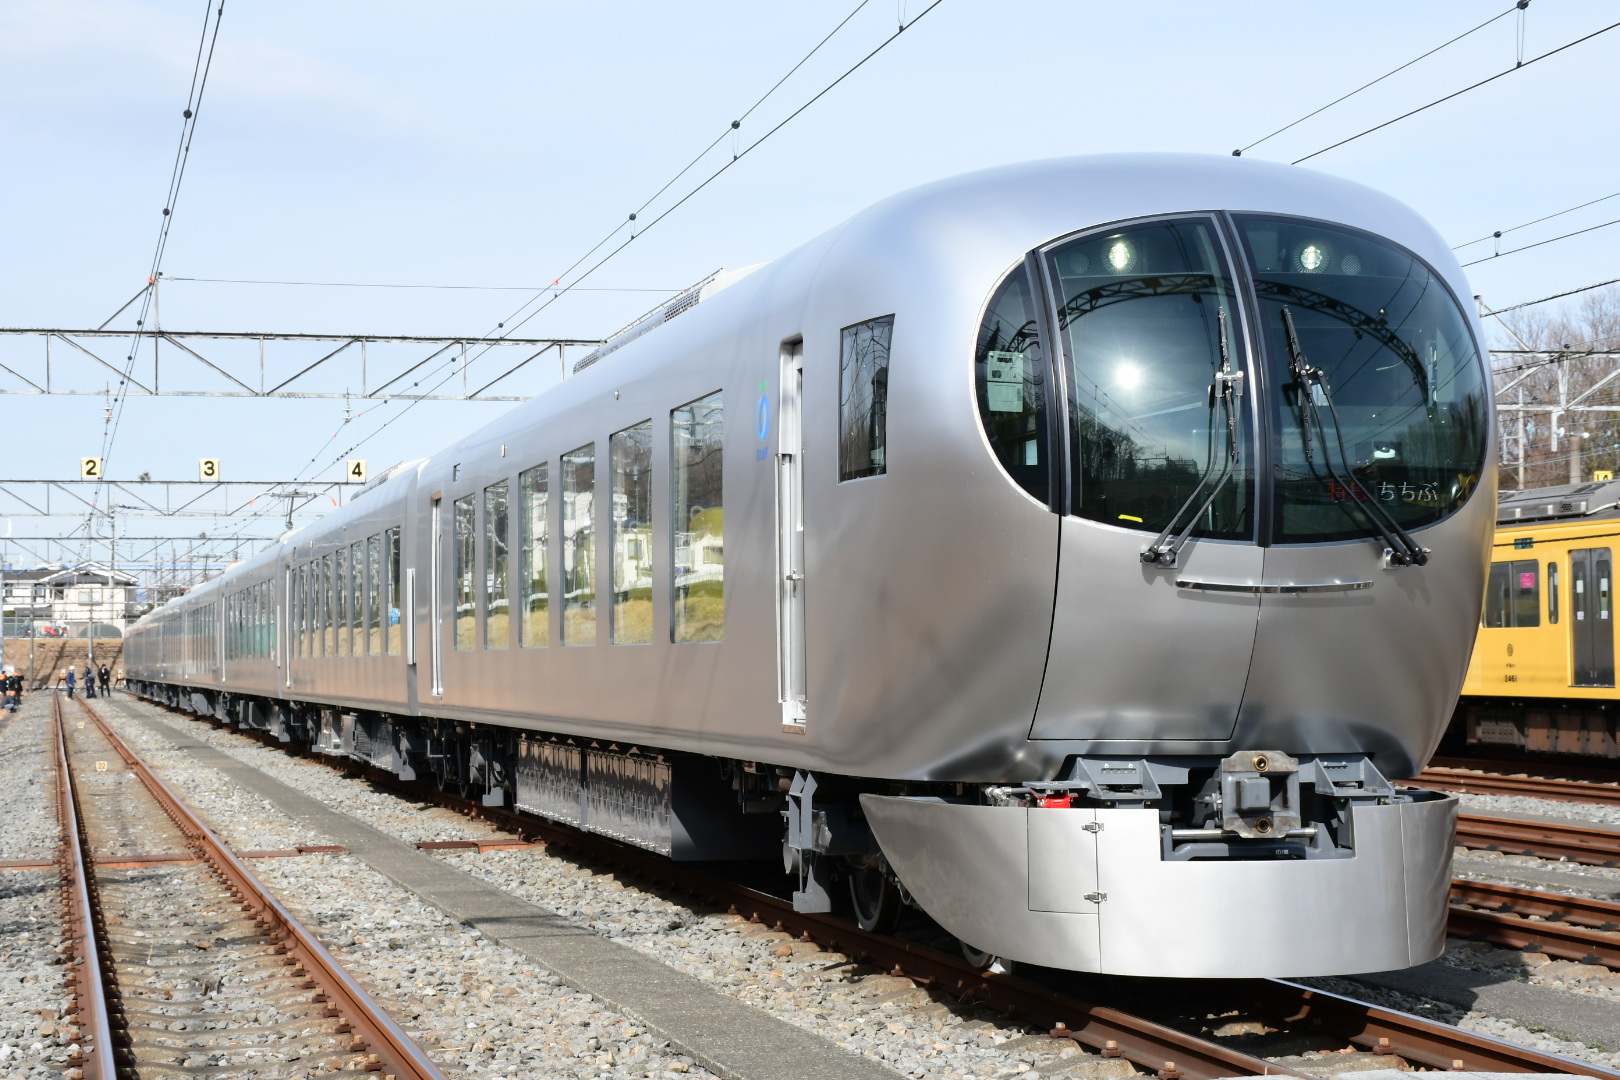 西武鉄道の新型特急車両、001系「Laview」